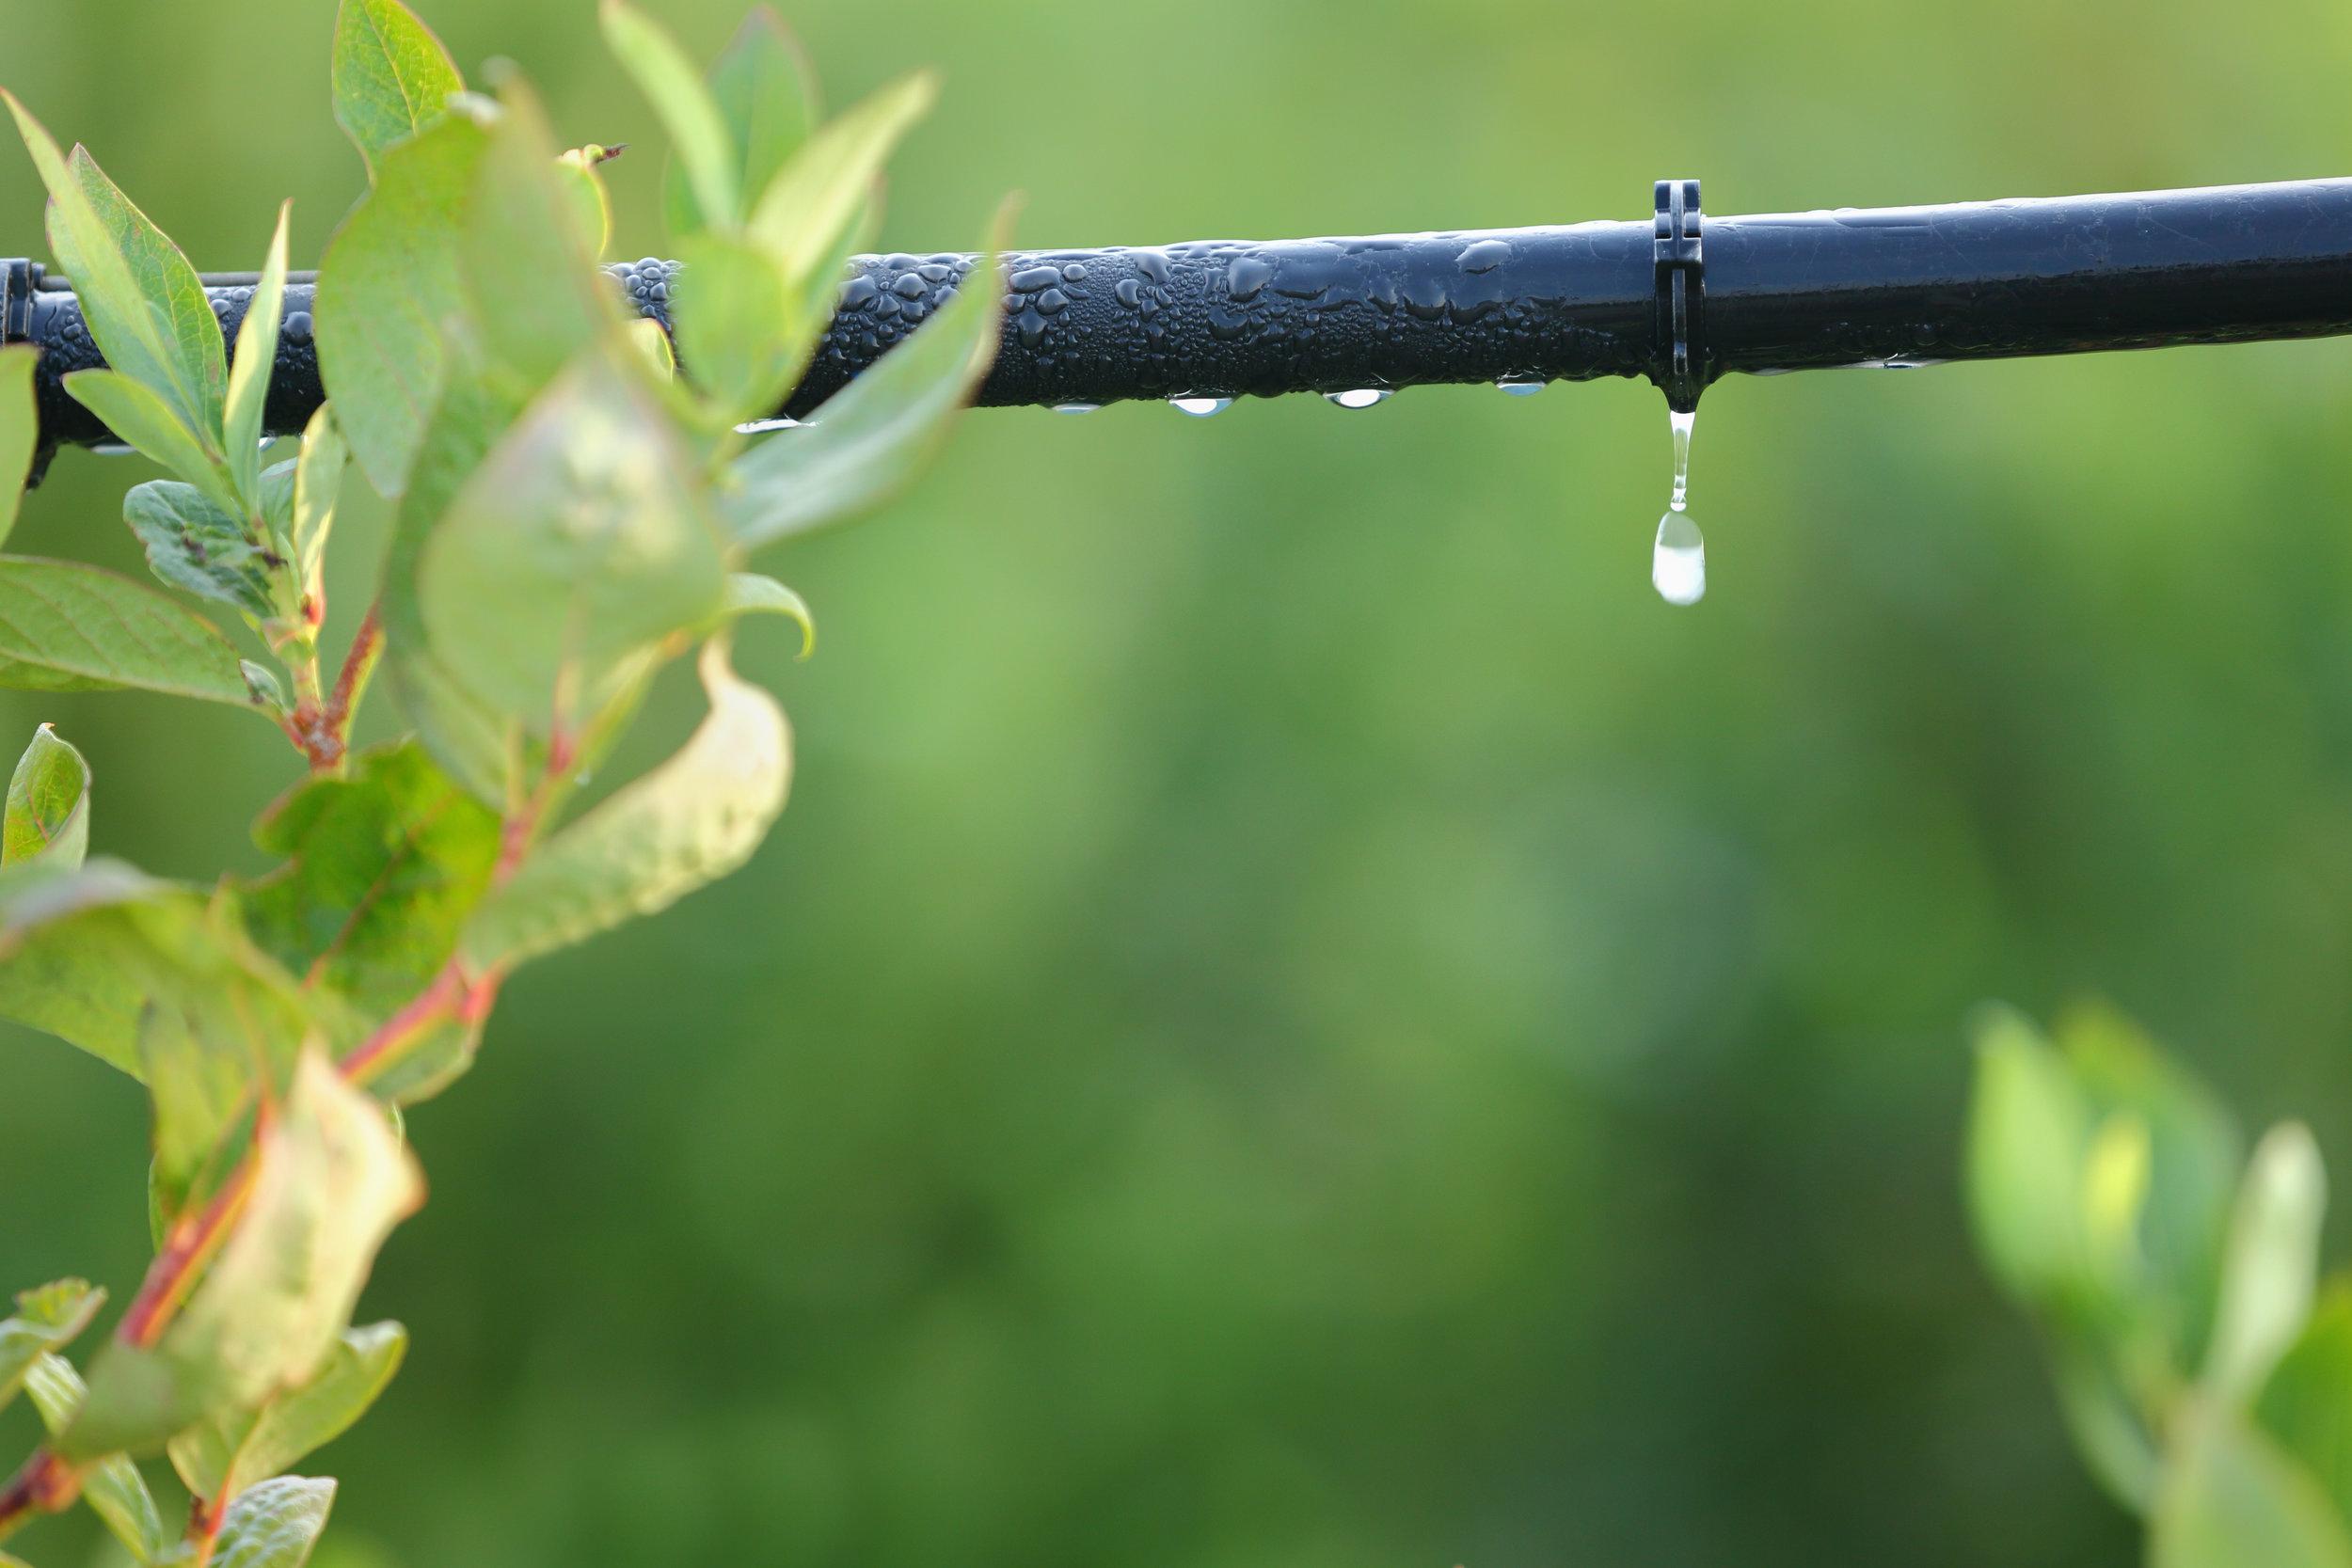 Family Drip Irrigation Malawi Crop Irrigation